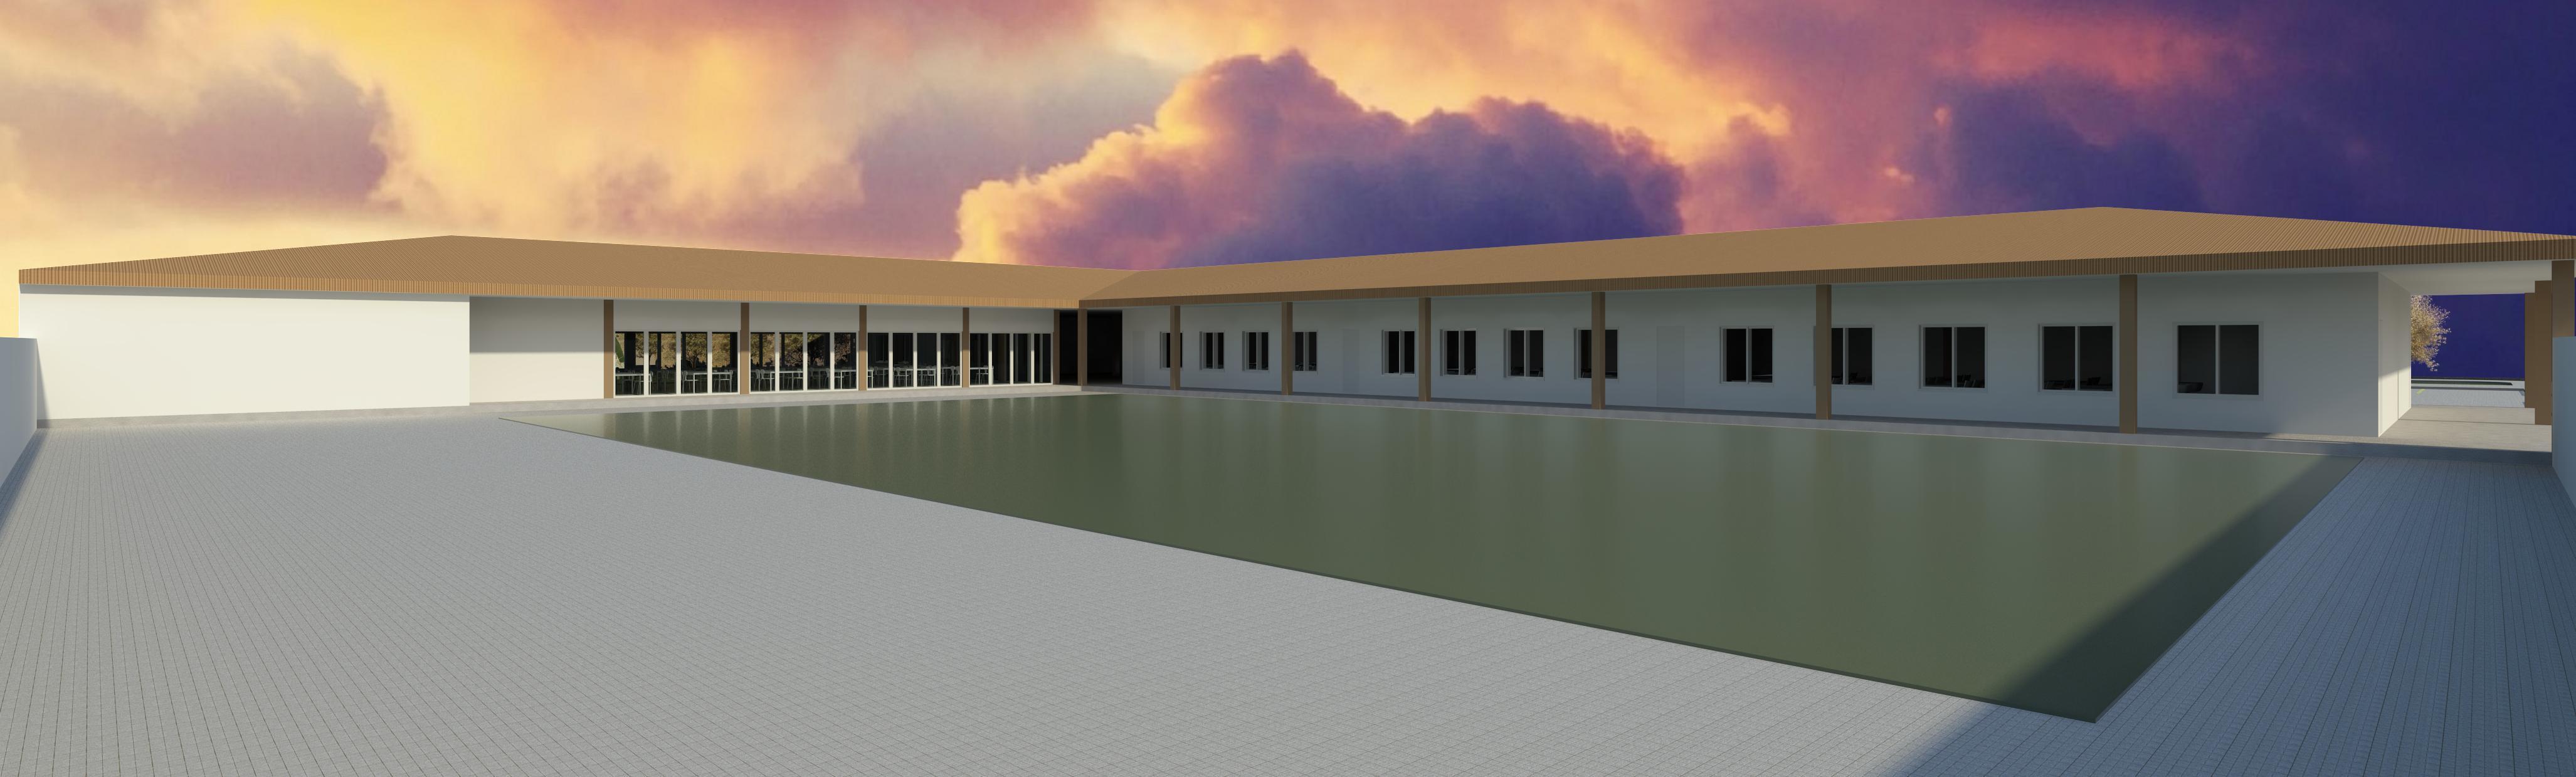 3D View 16.jpg